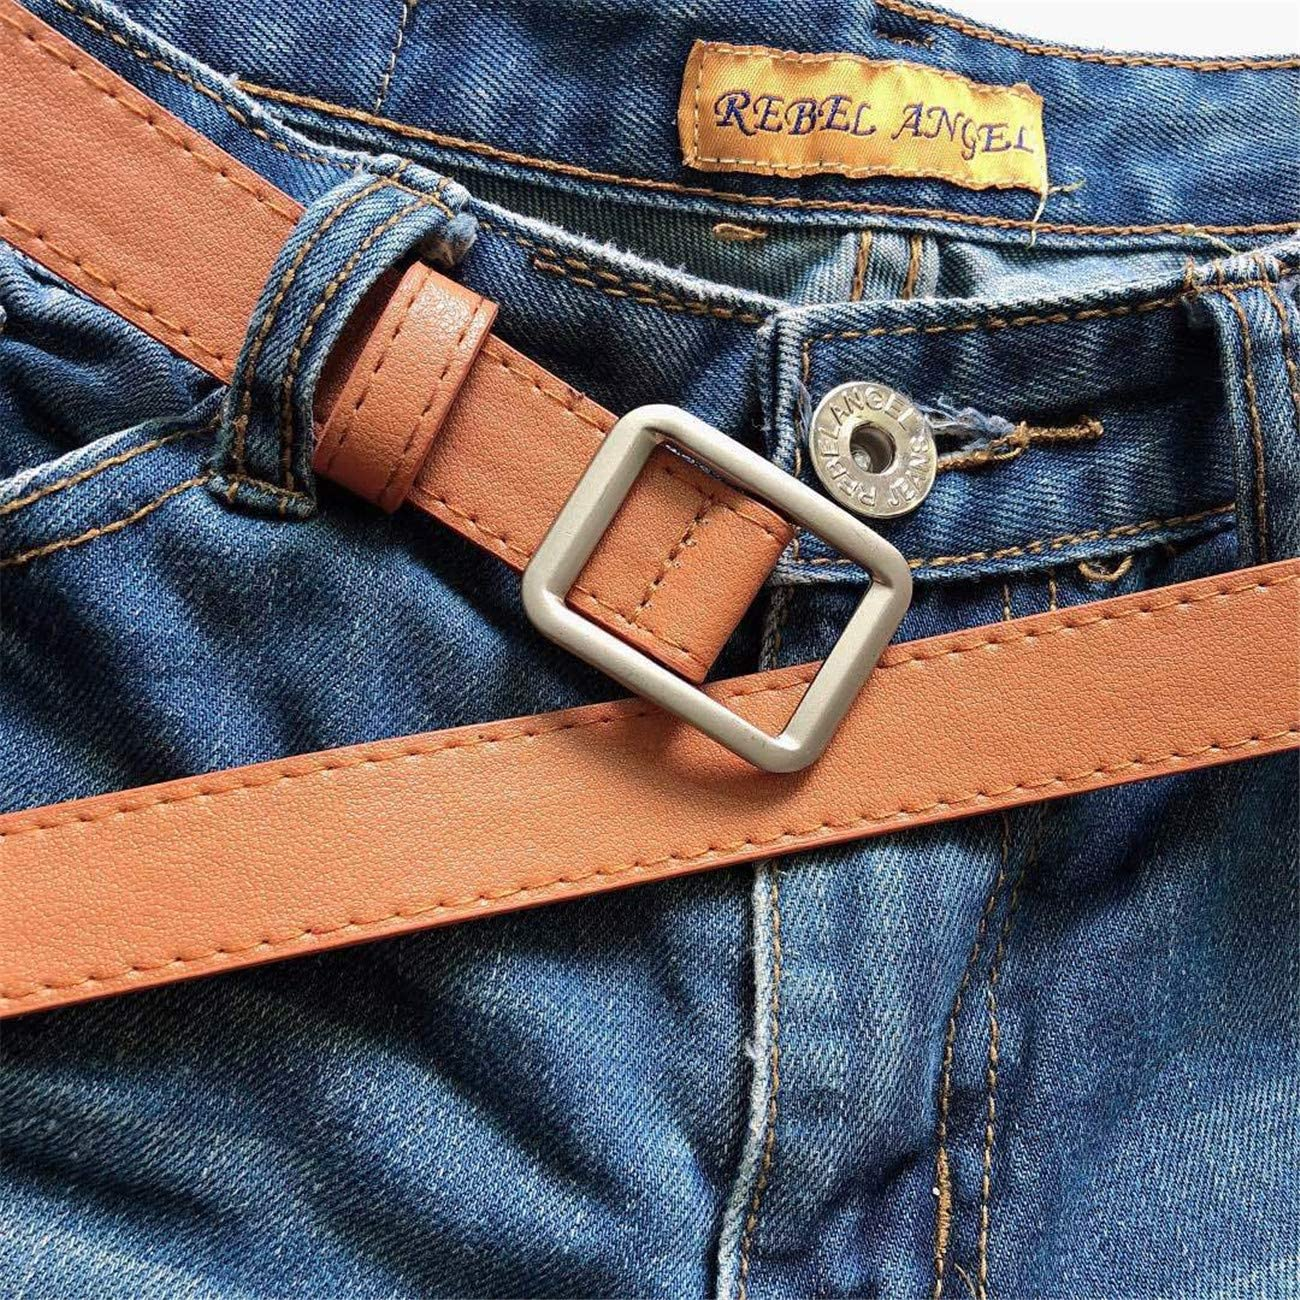 Soluo Women Retro No Holes Belt Alloy Buckle Belt for Dresses Square Alloy Waist Fiber Belts